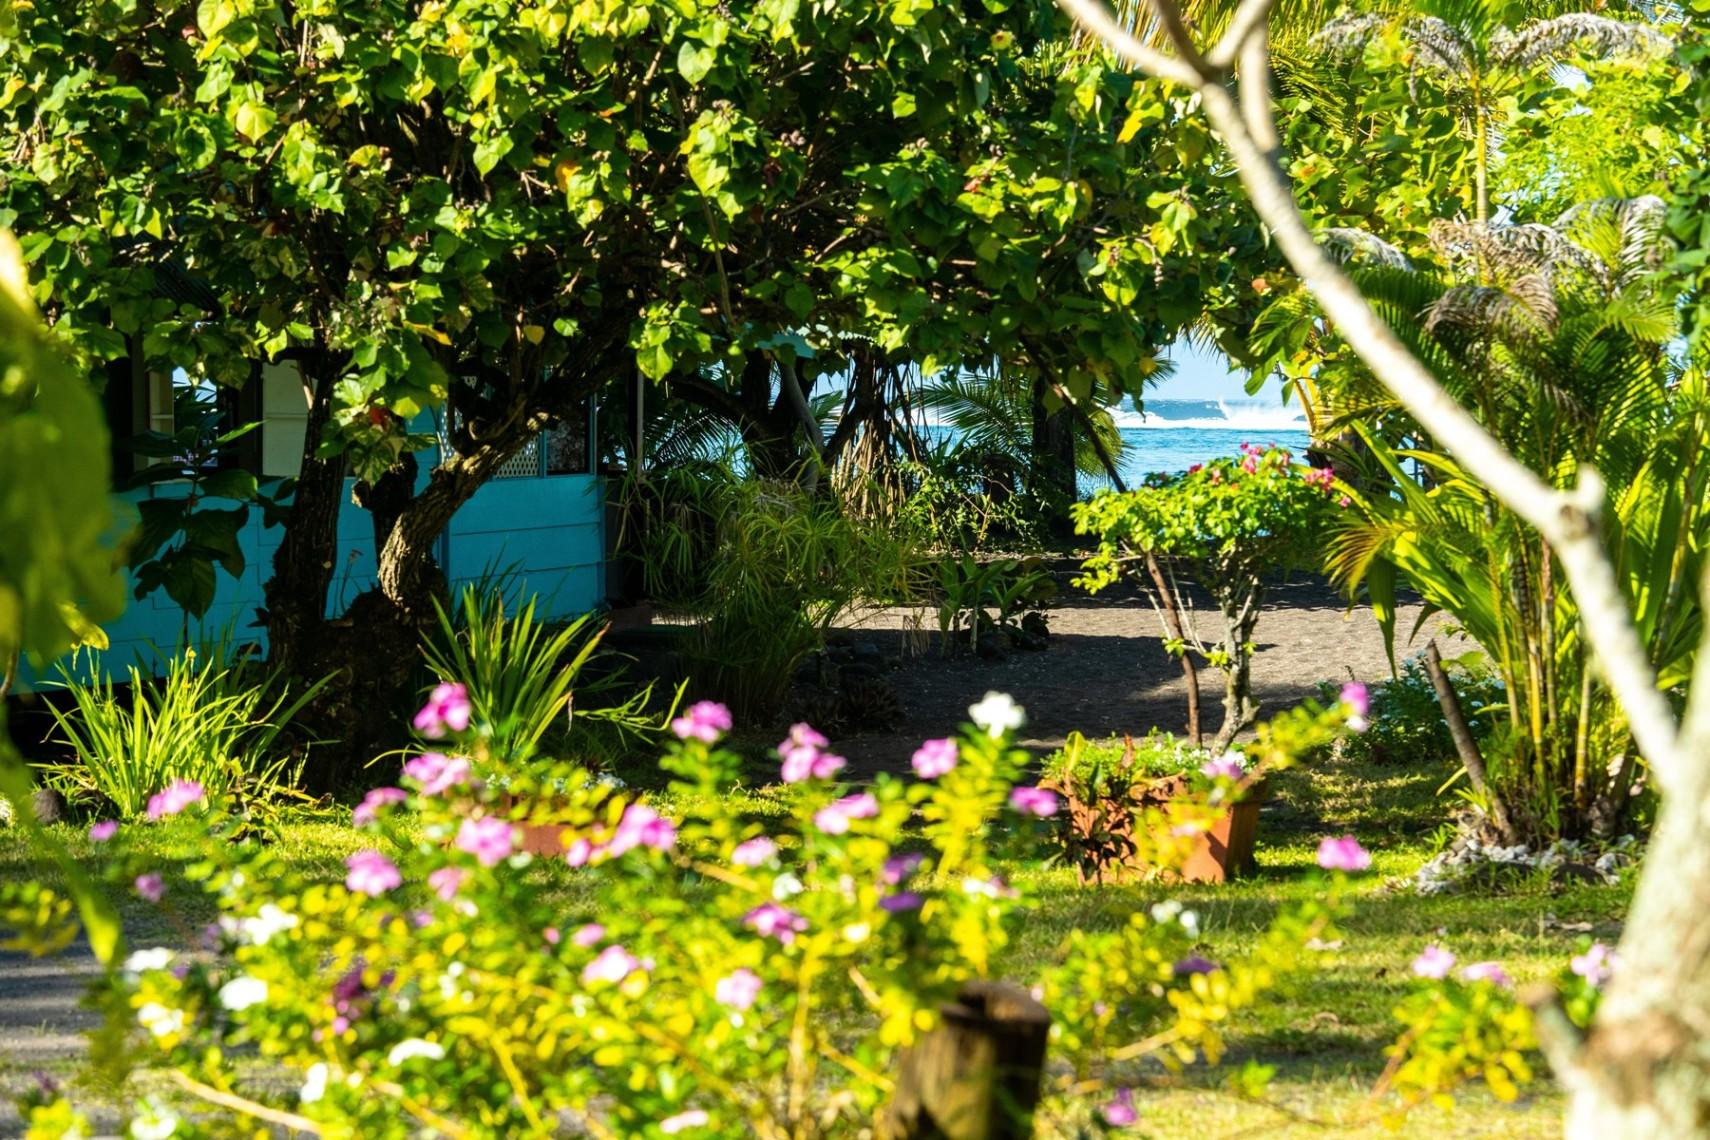 https://tahititourisme.cl/wp-content/uploads/2019/08/copie-tahiti-tourisme-800ko-1.jpg